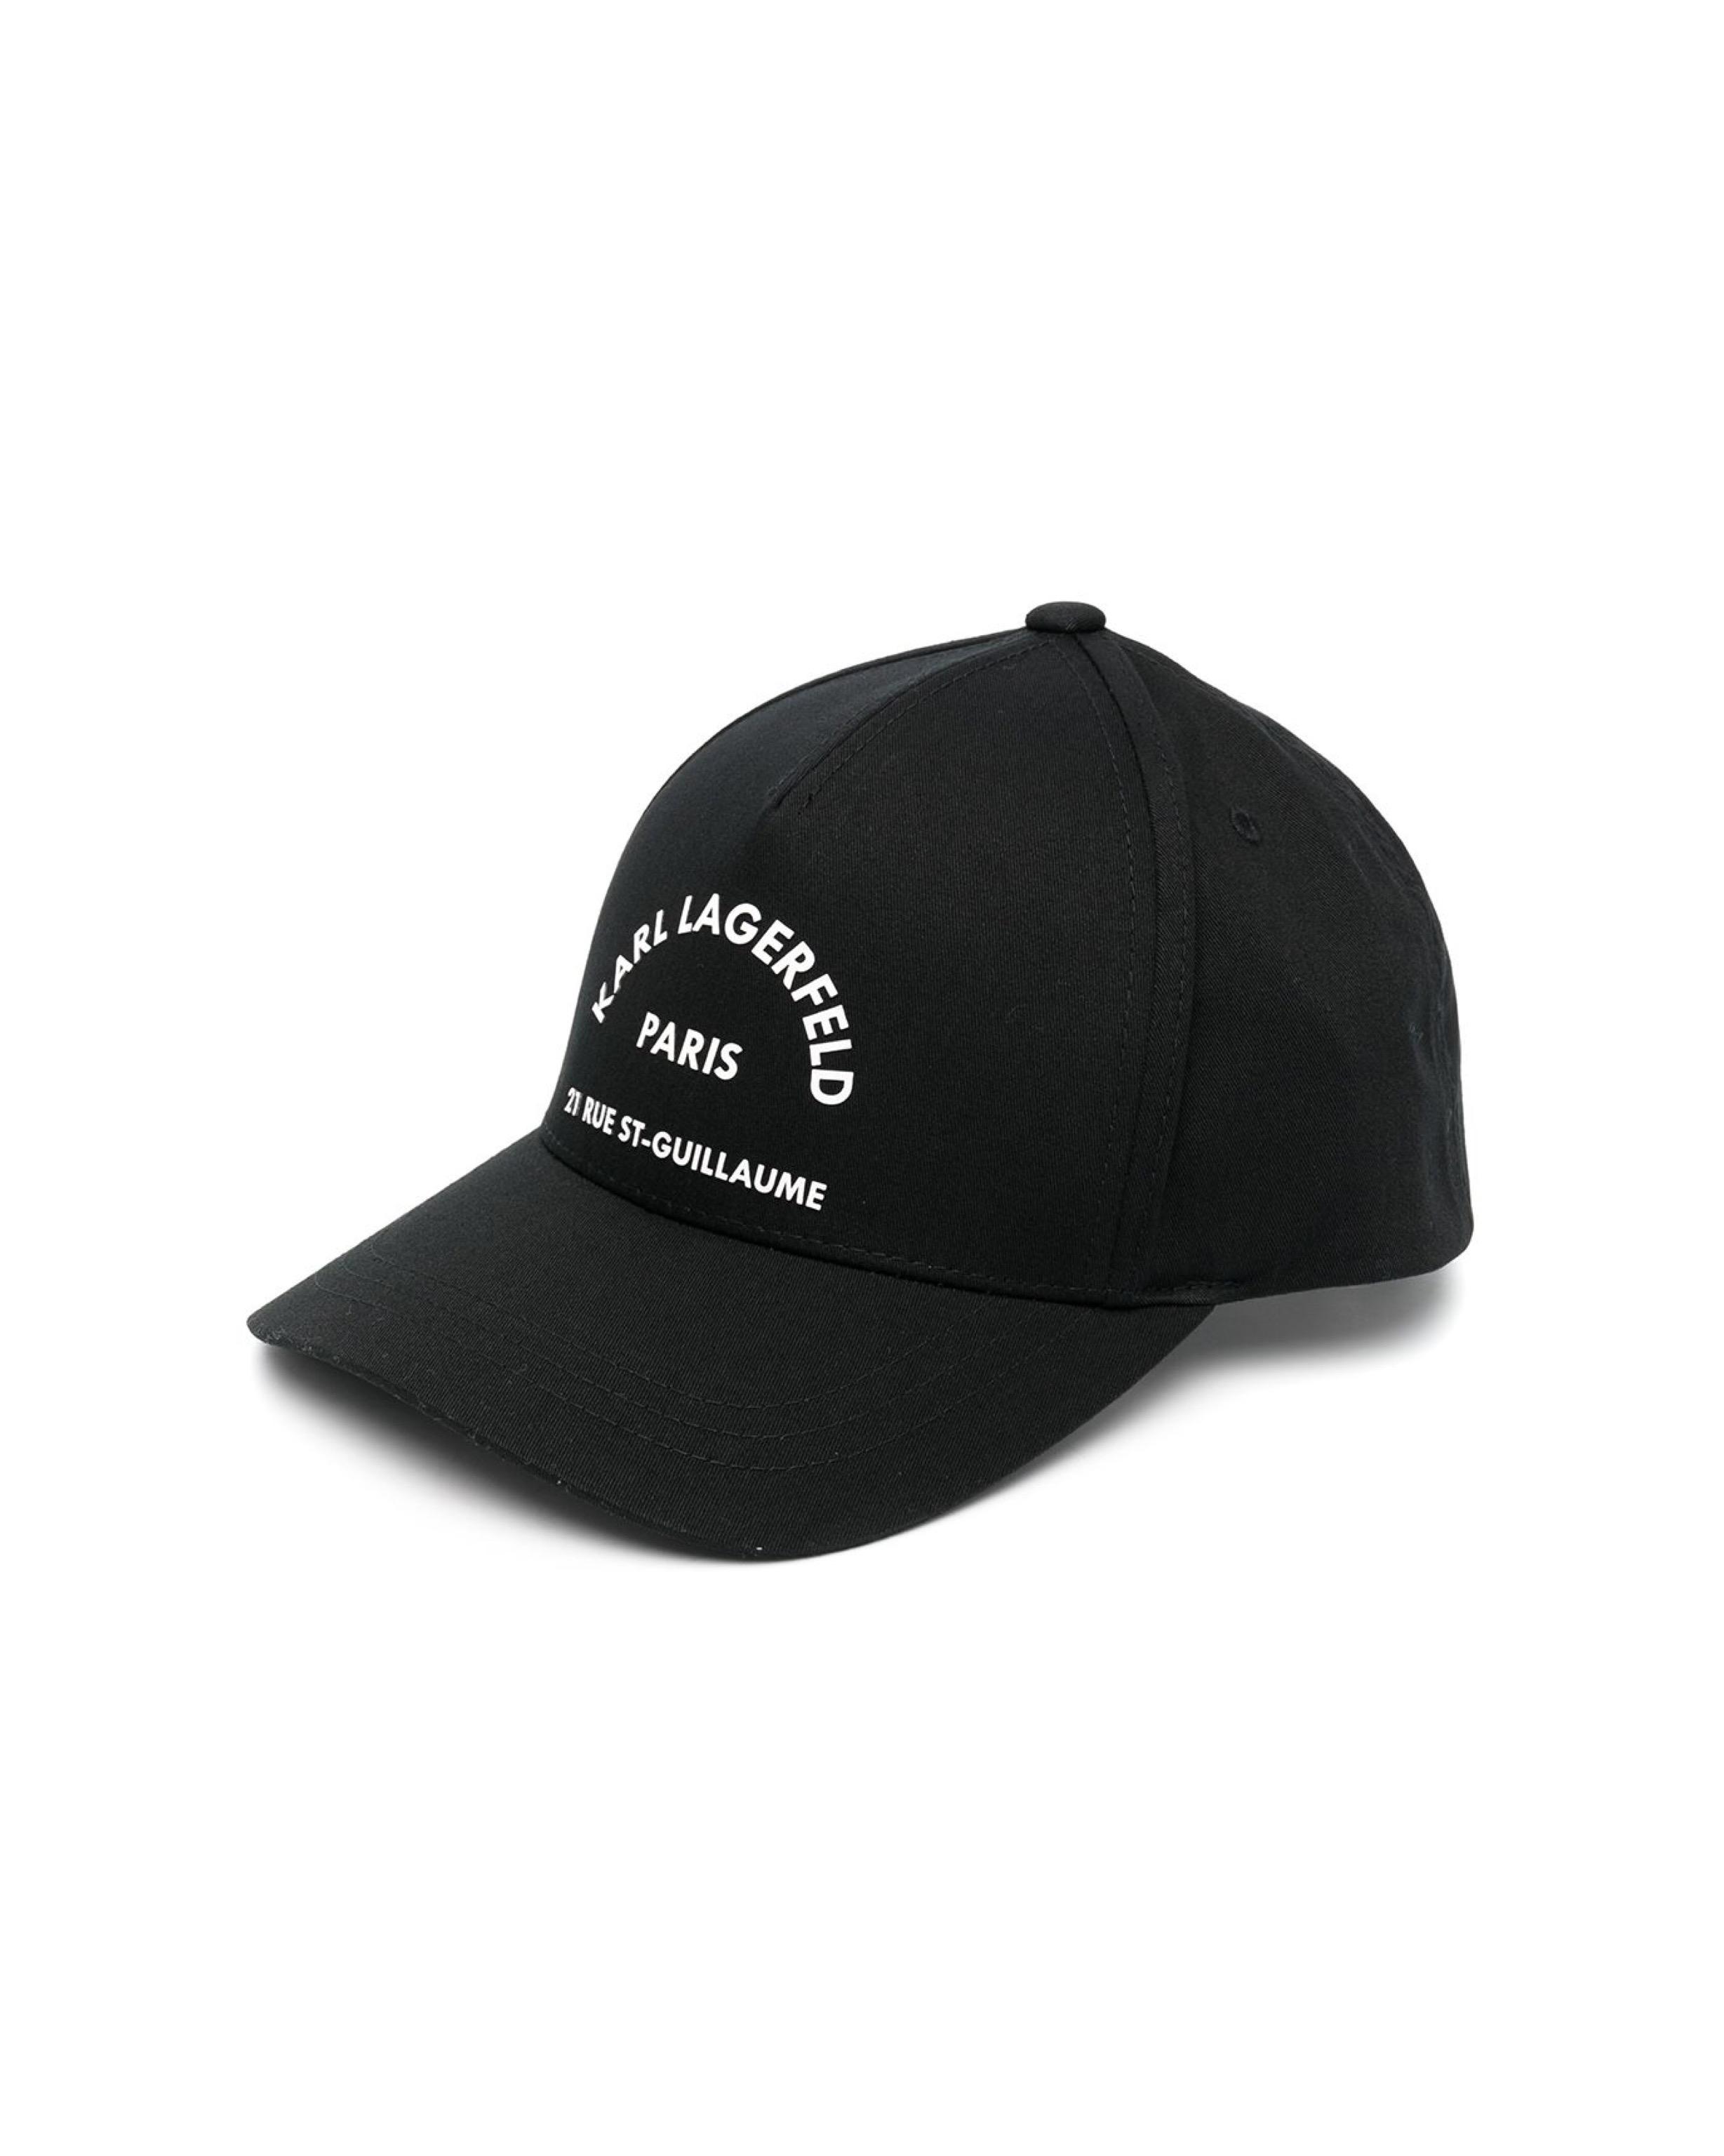 Karl Lagerfeld $80.00